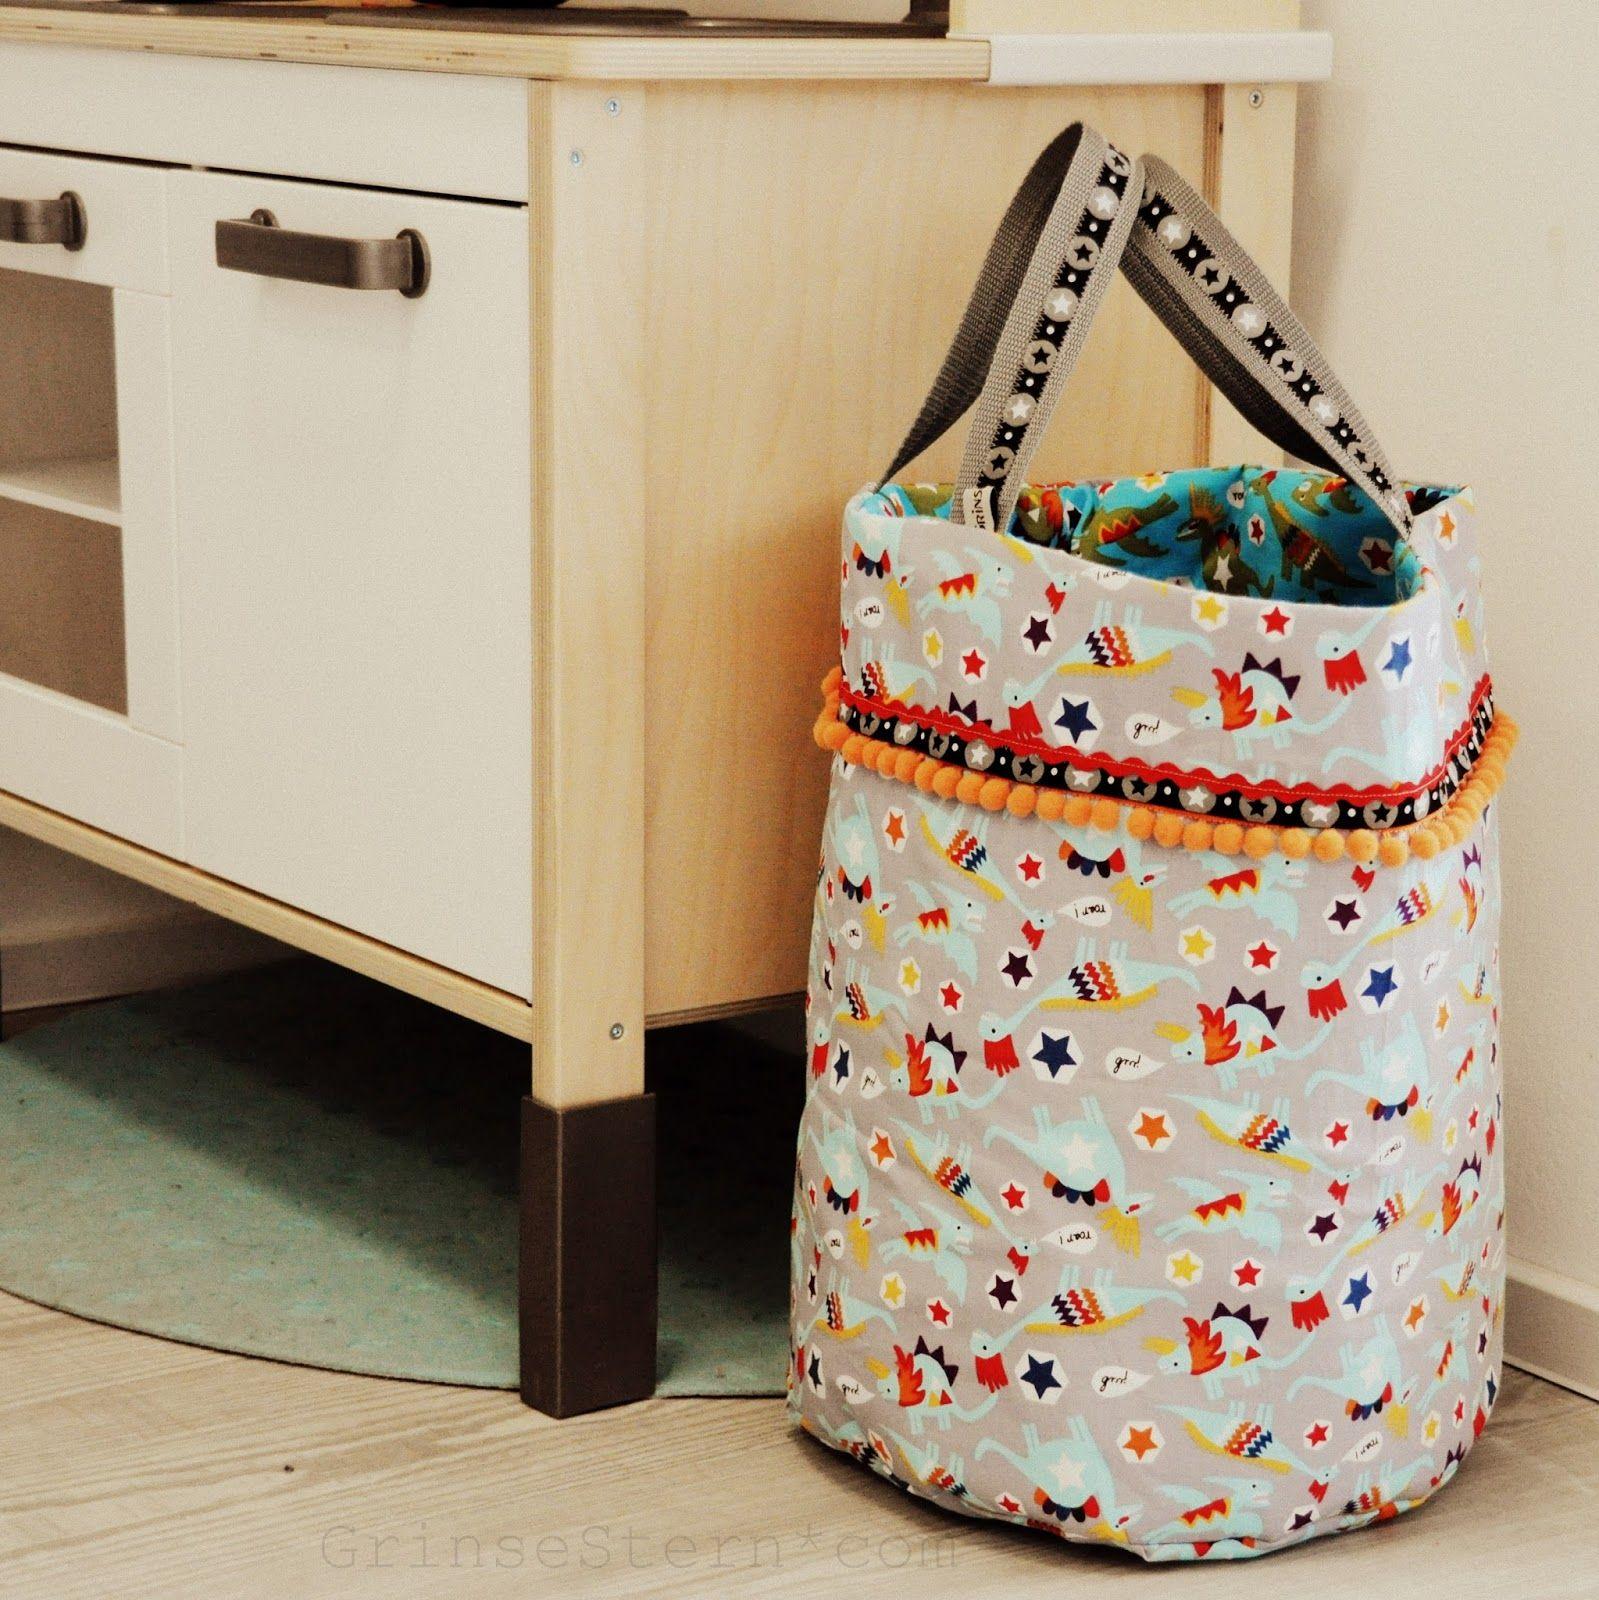 alle guten dinge sind drei jolijou bags pinterest jolijou gute dinge und spielzeugkorb. Black Bedroom Furniture Sets. Home Design Ideas